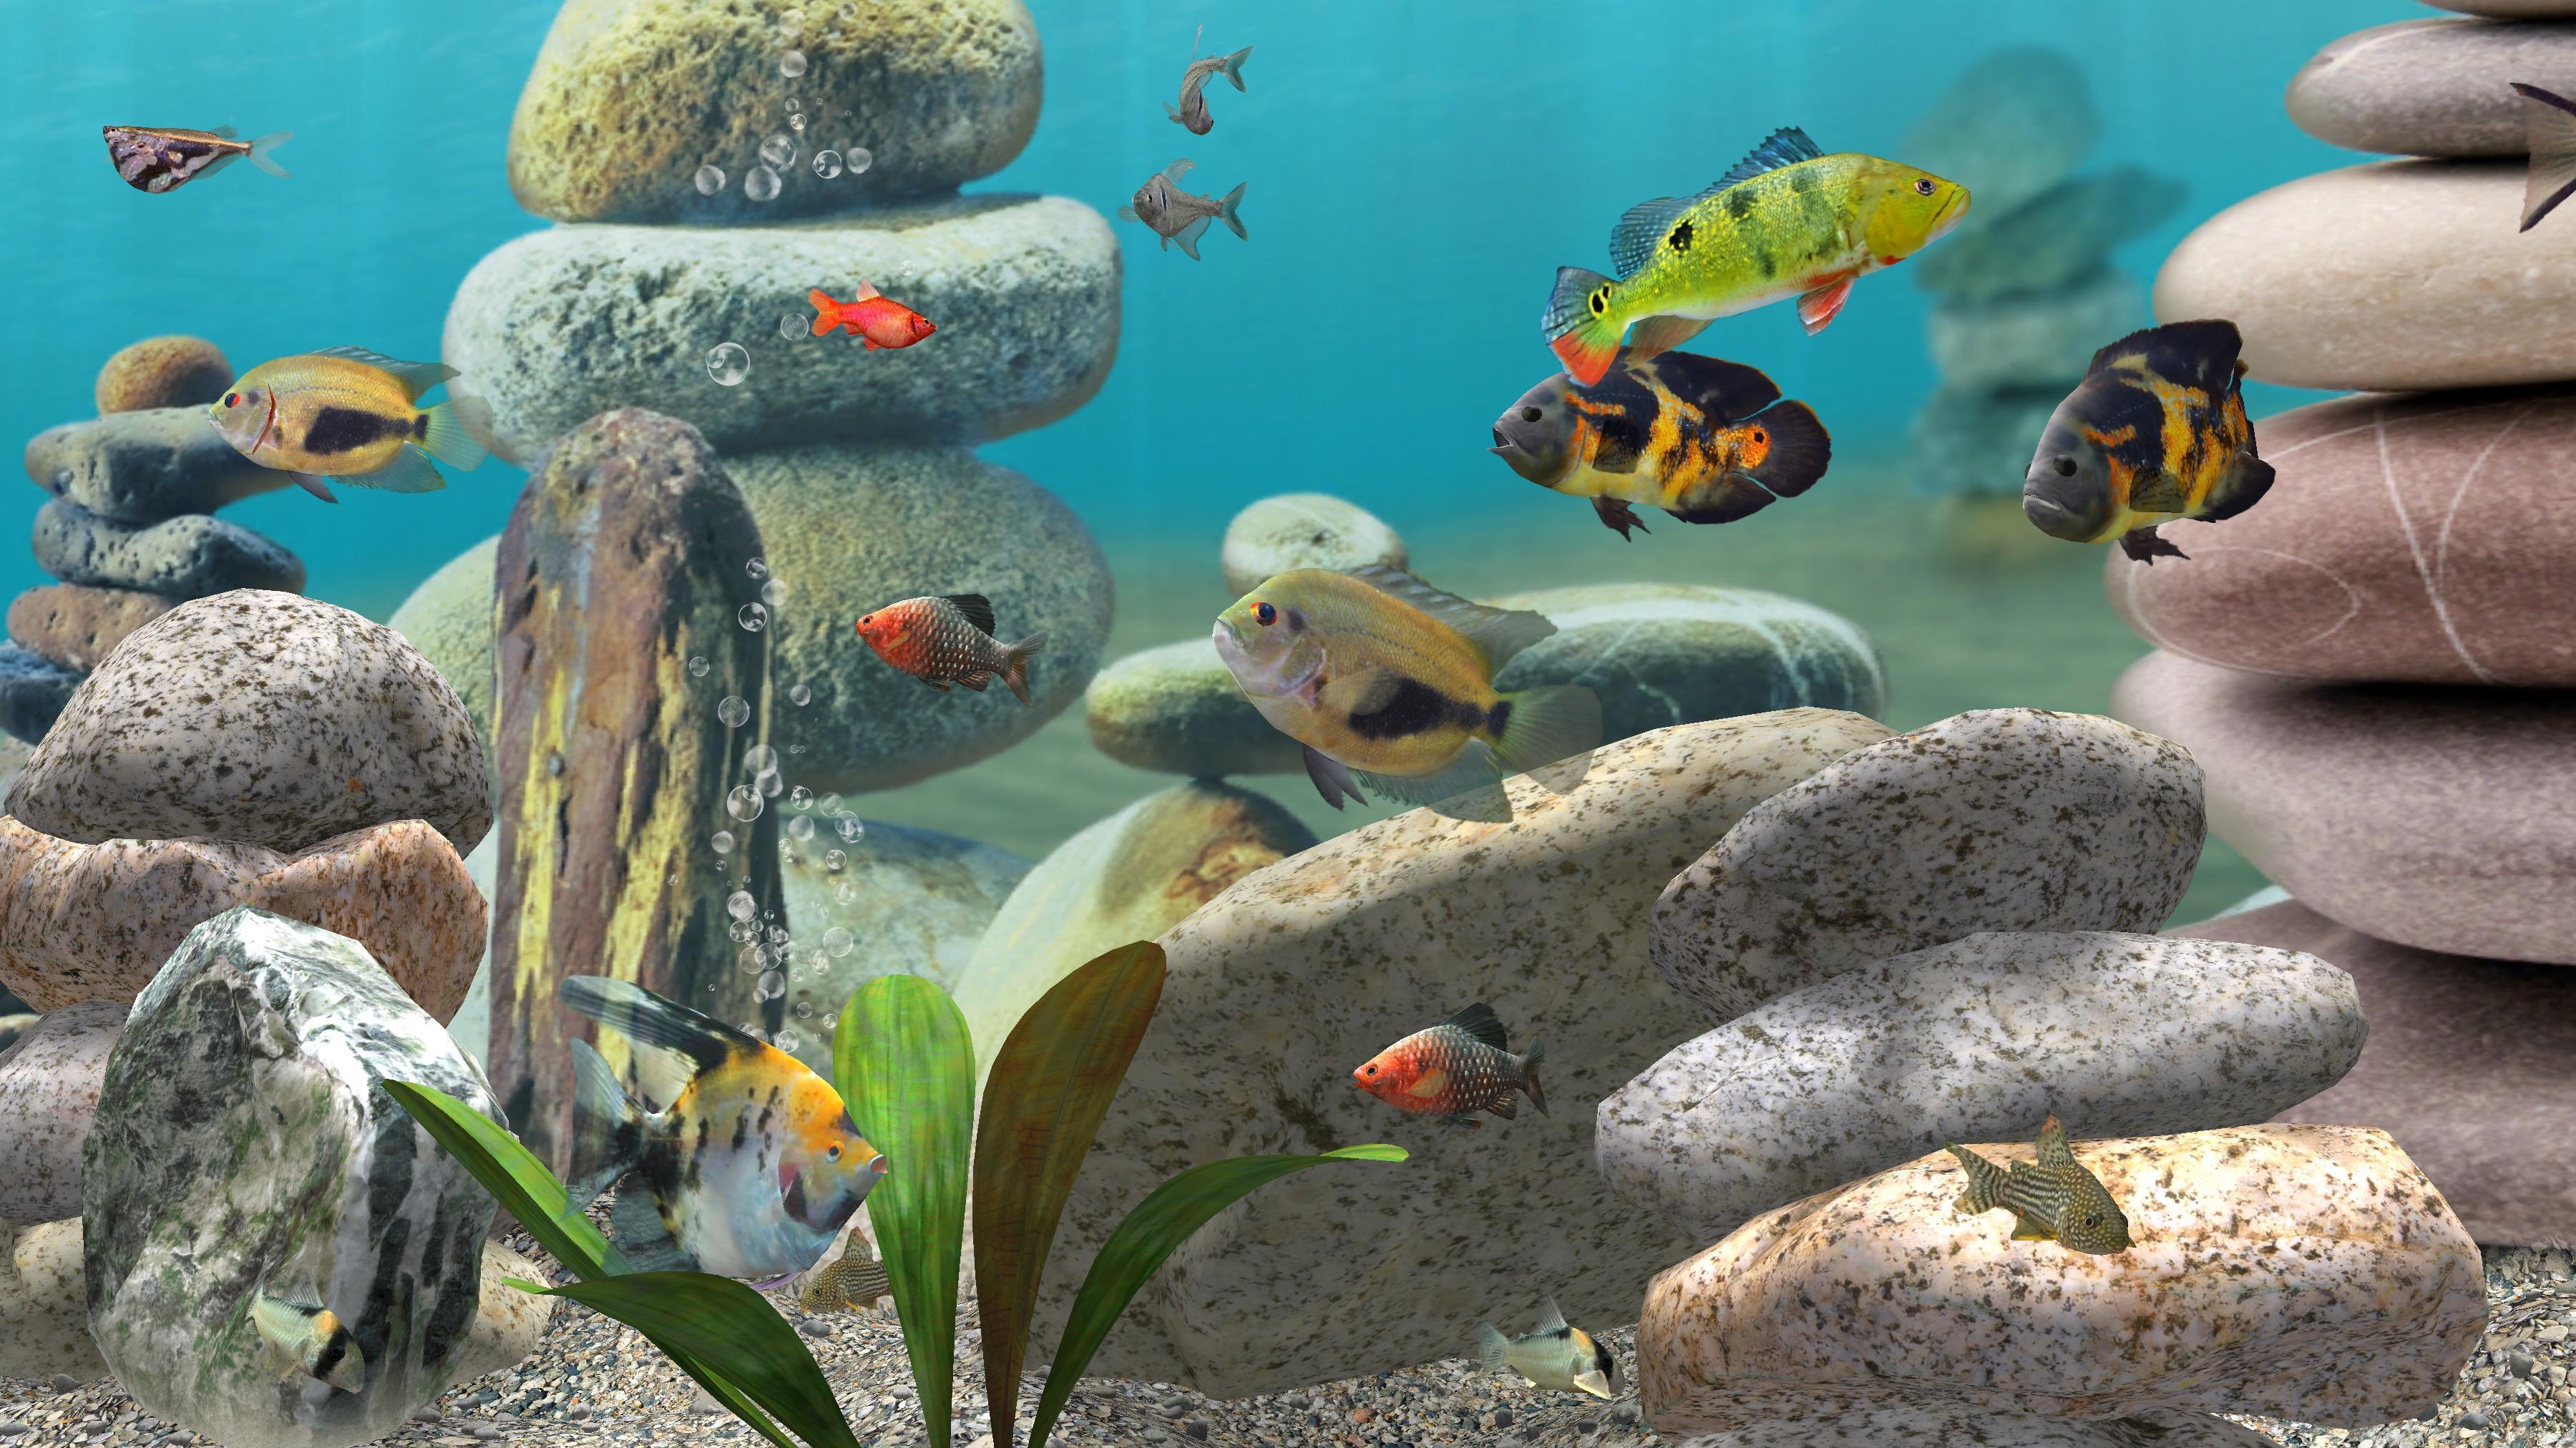 Fish Farm 3 Live Wallpaper: 3D Aquarium Background for Android - APK